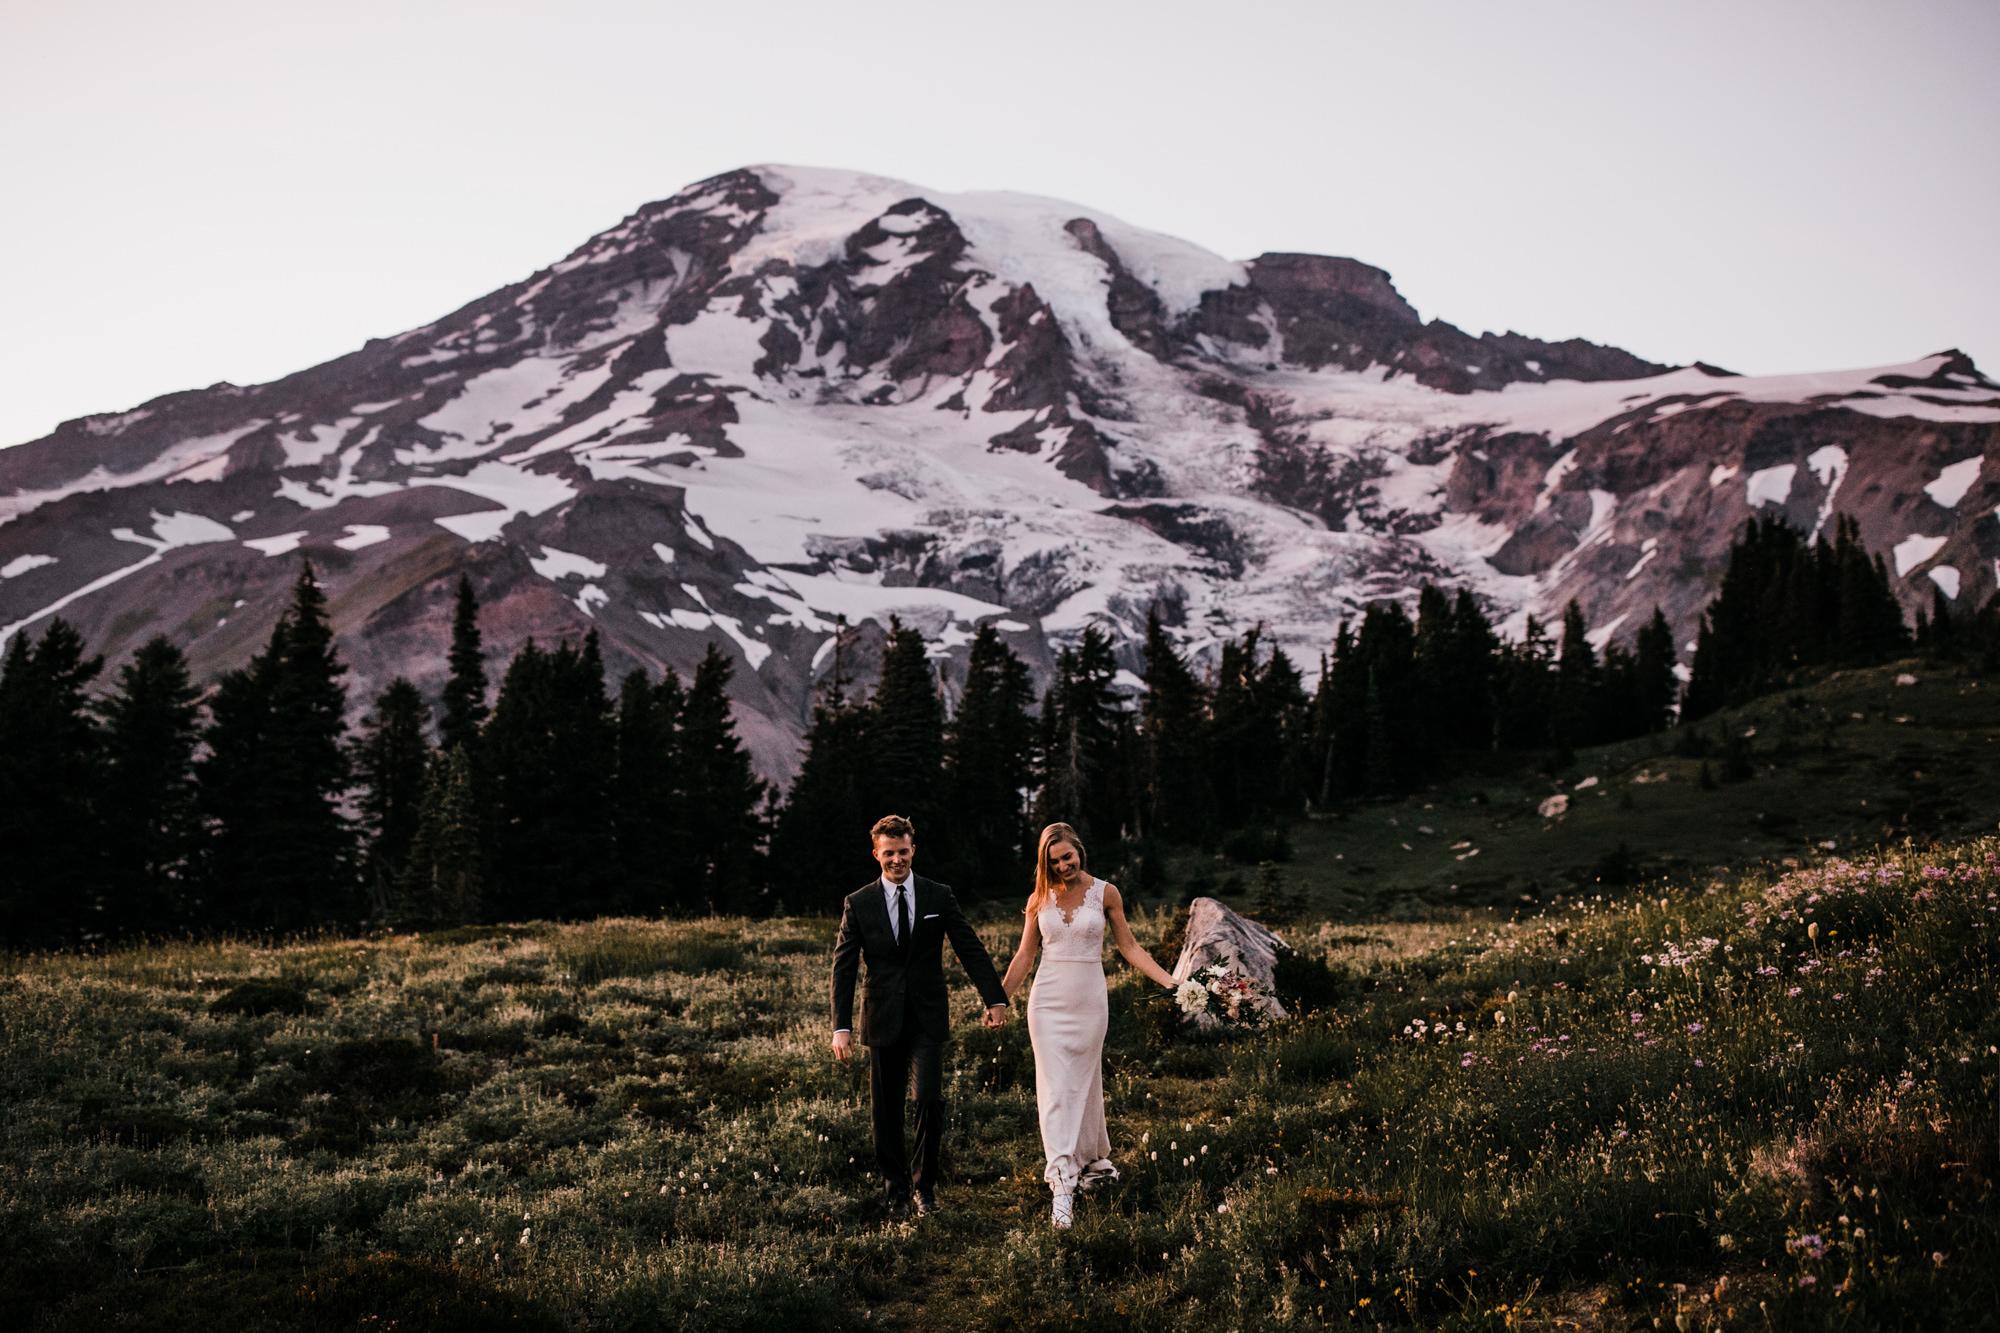 mount rainier national park adventure elopement | destination adventure wedding photographers | the hearnes adventure photography | www.thehearnes.com